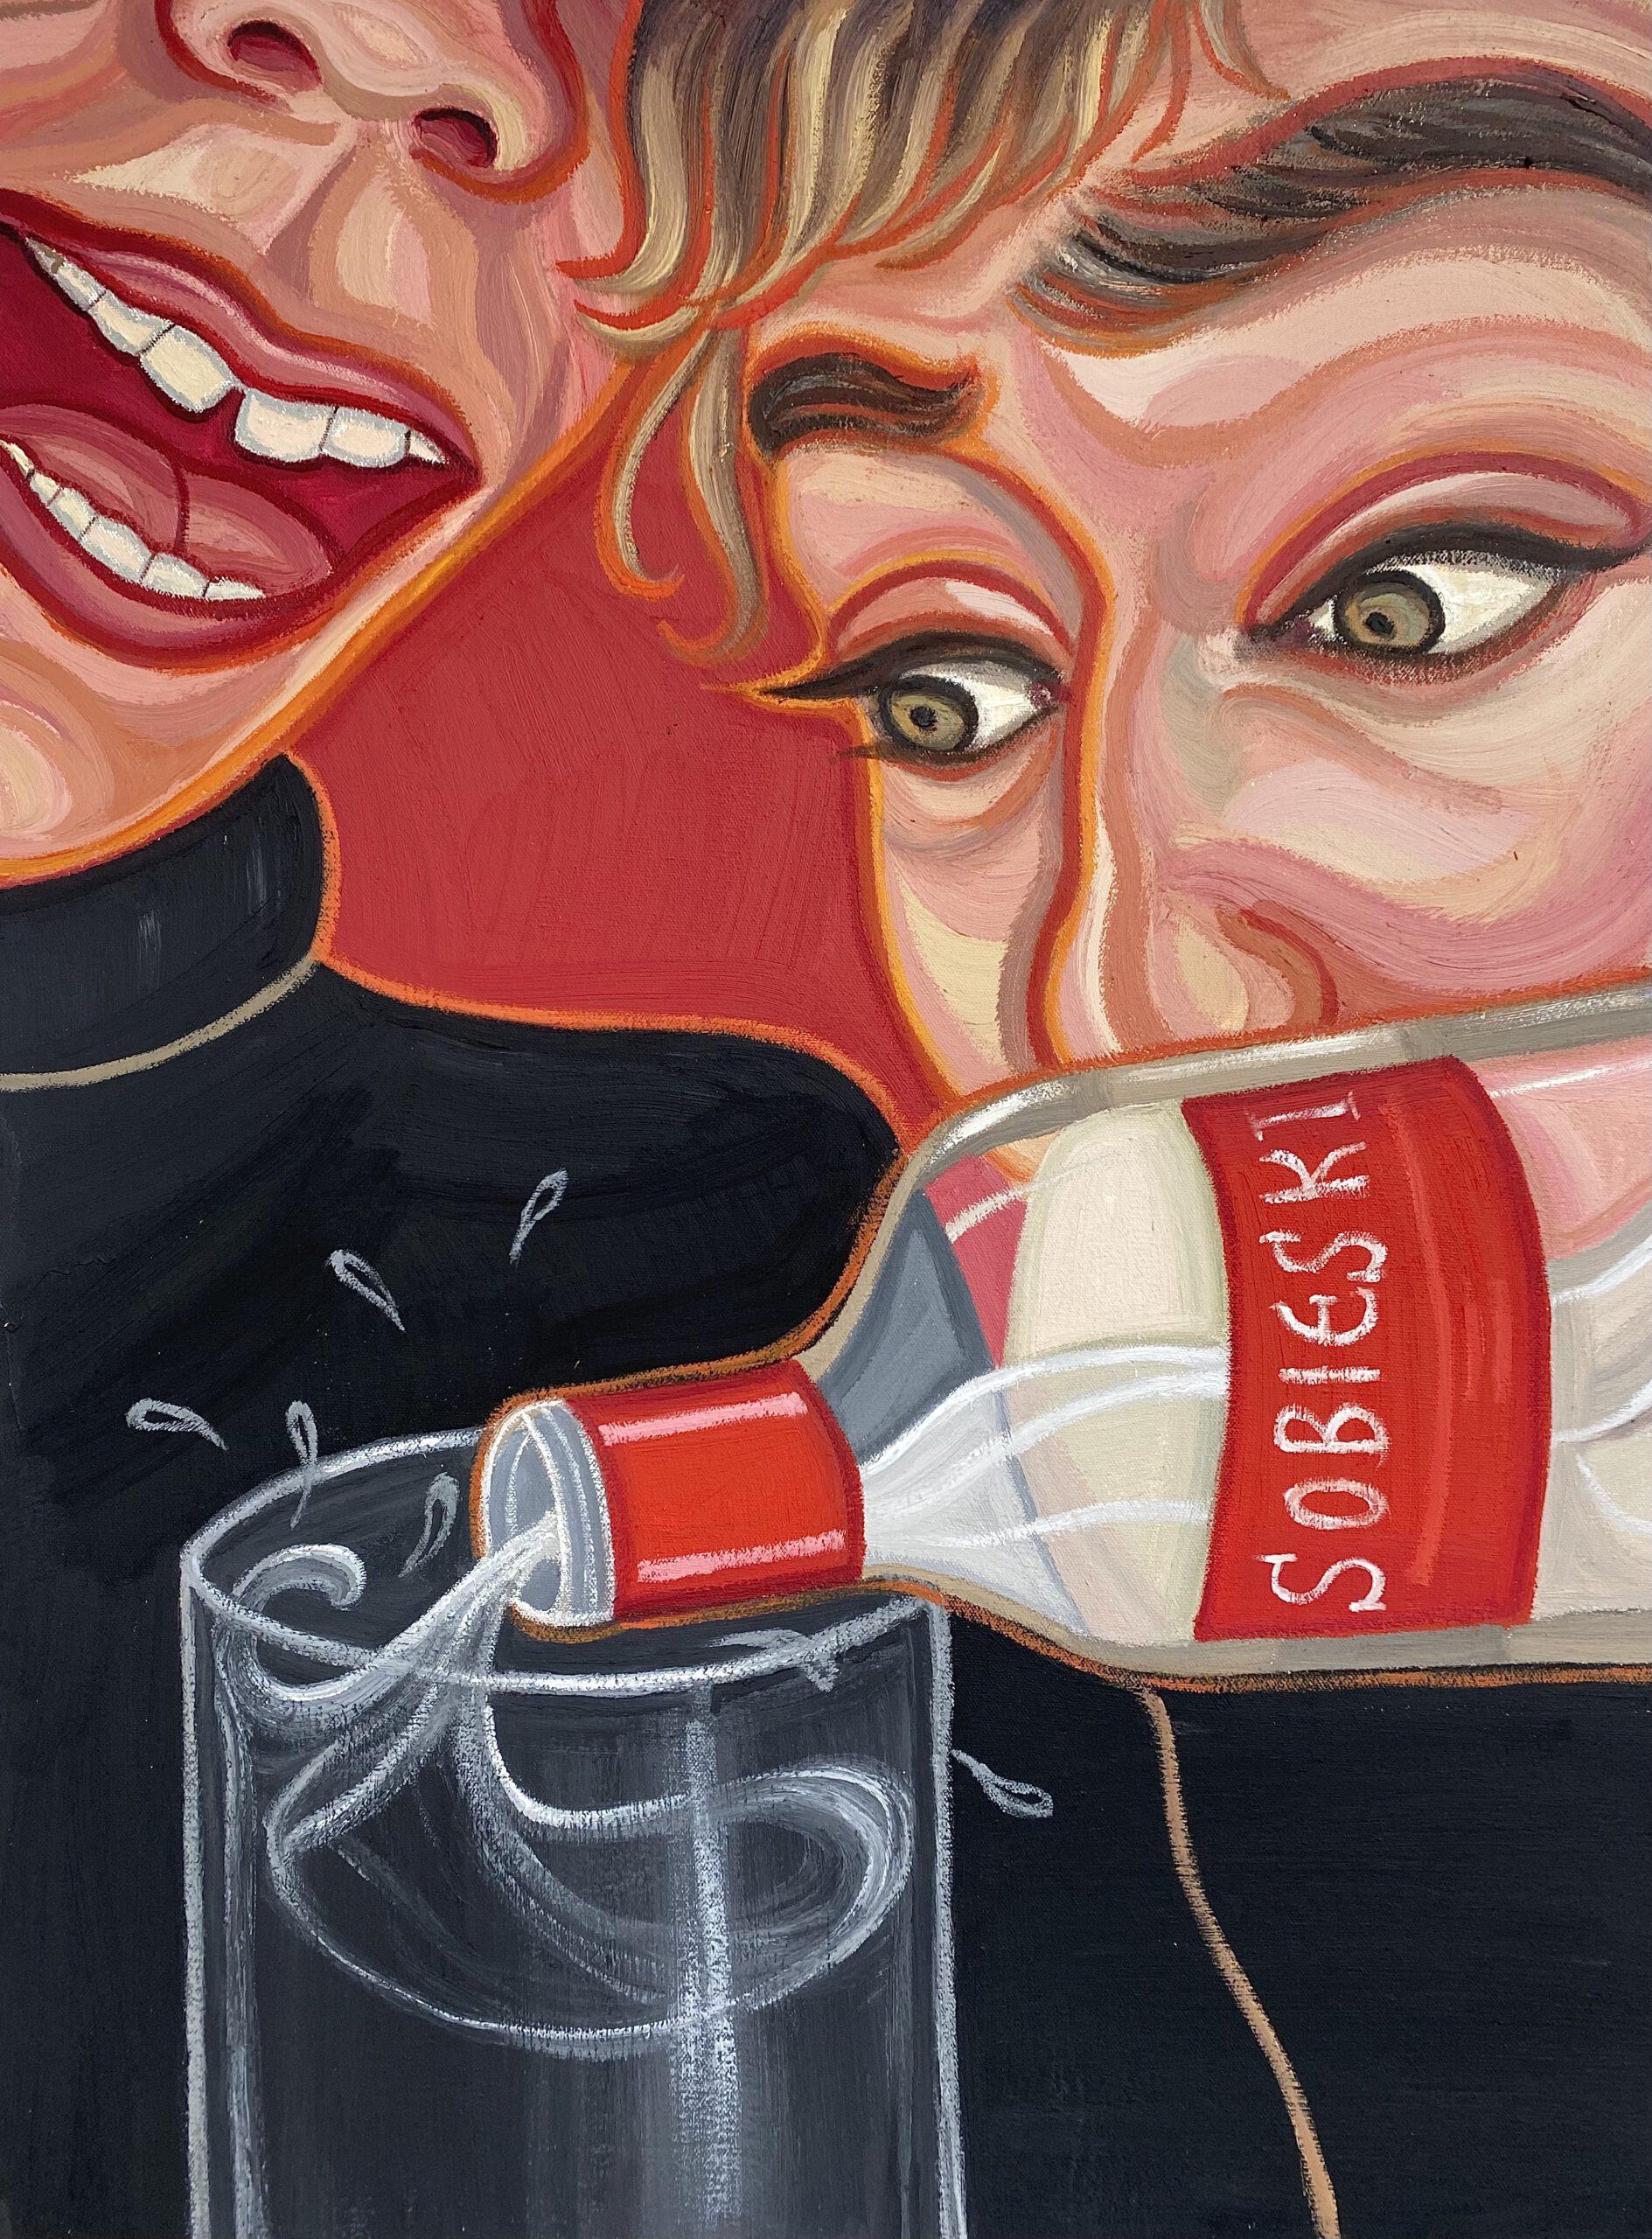 Sobieski, 2021, 60 x 80 cm, oil on canvas